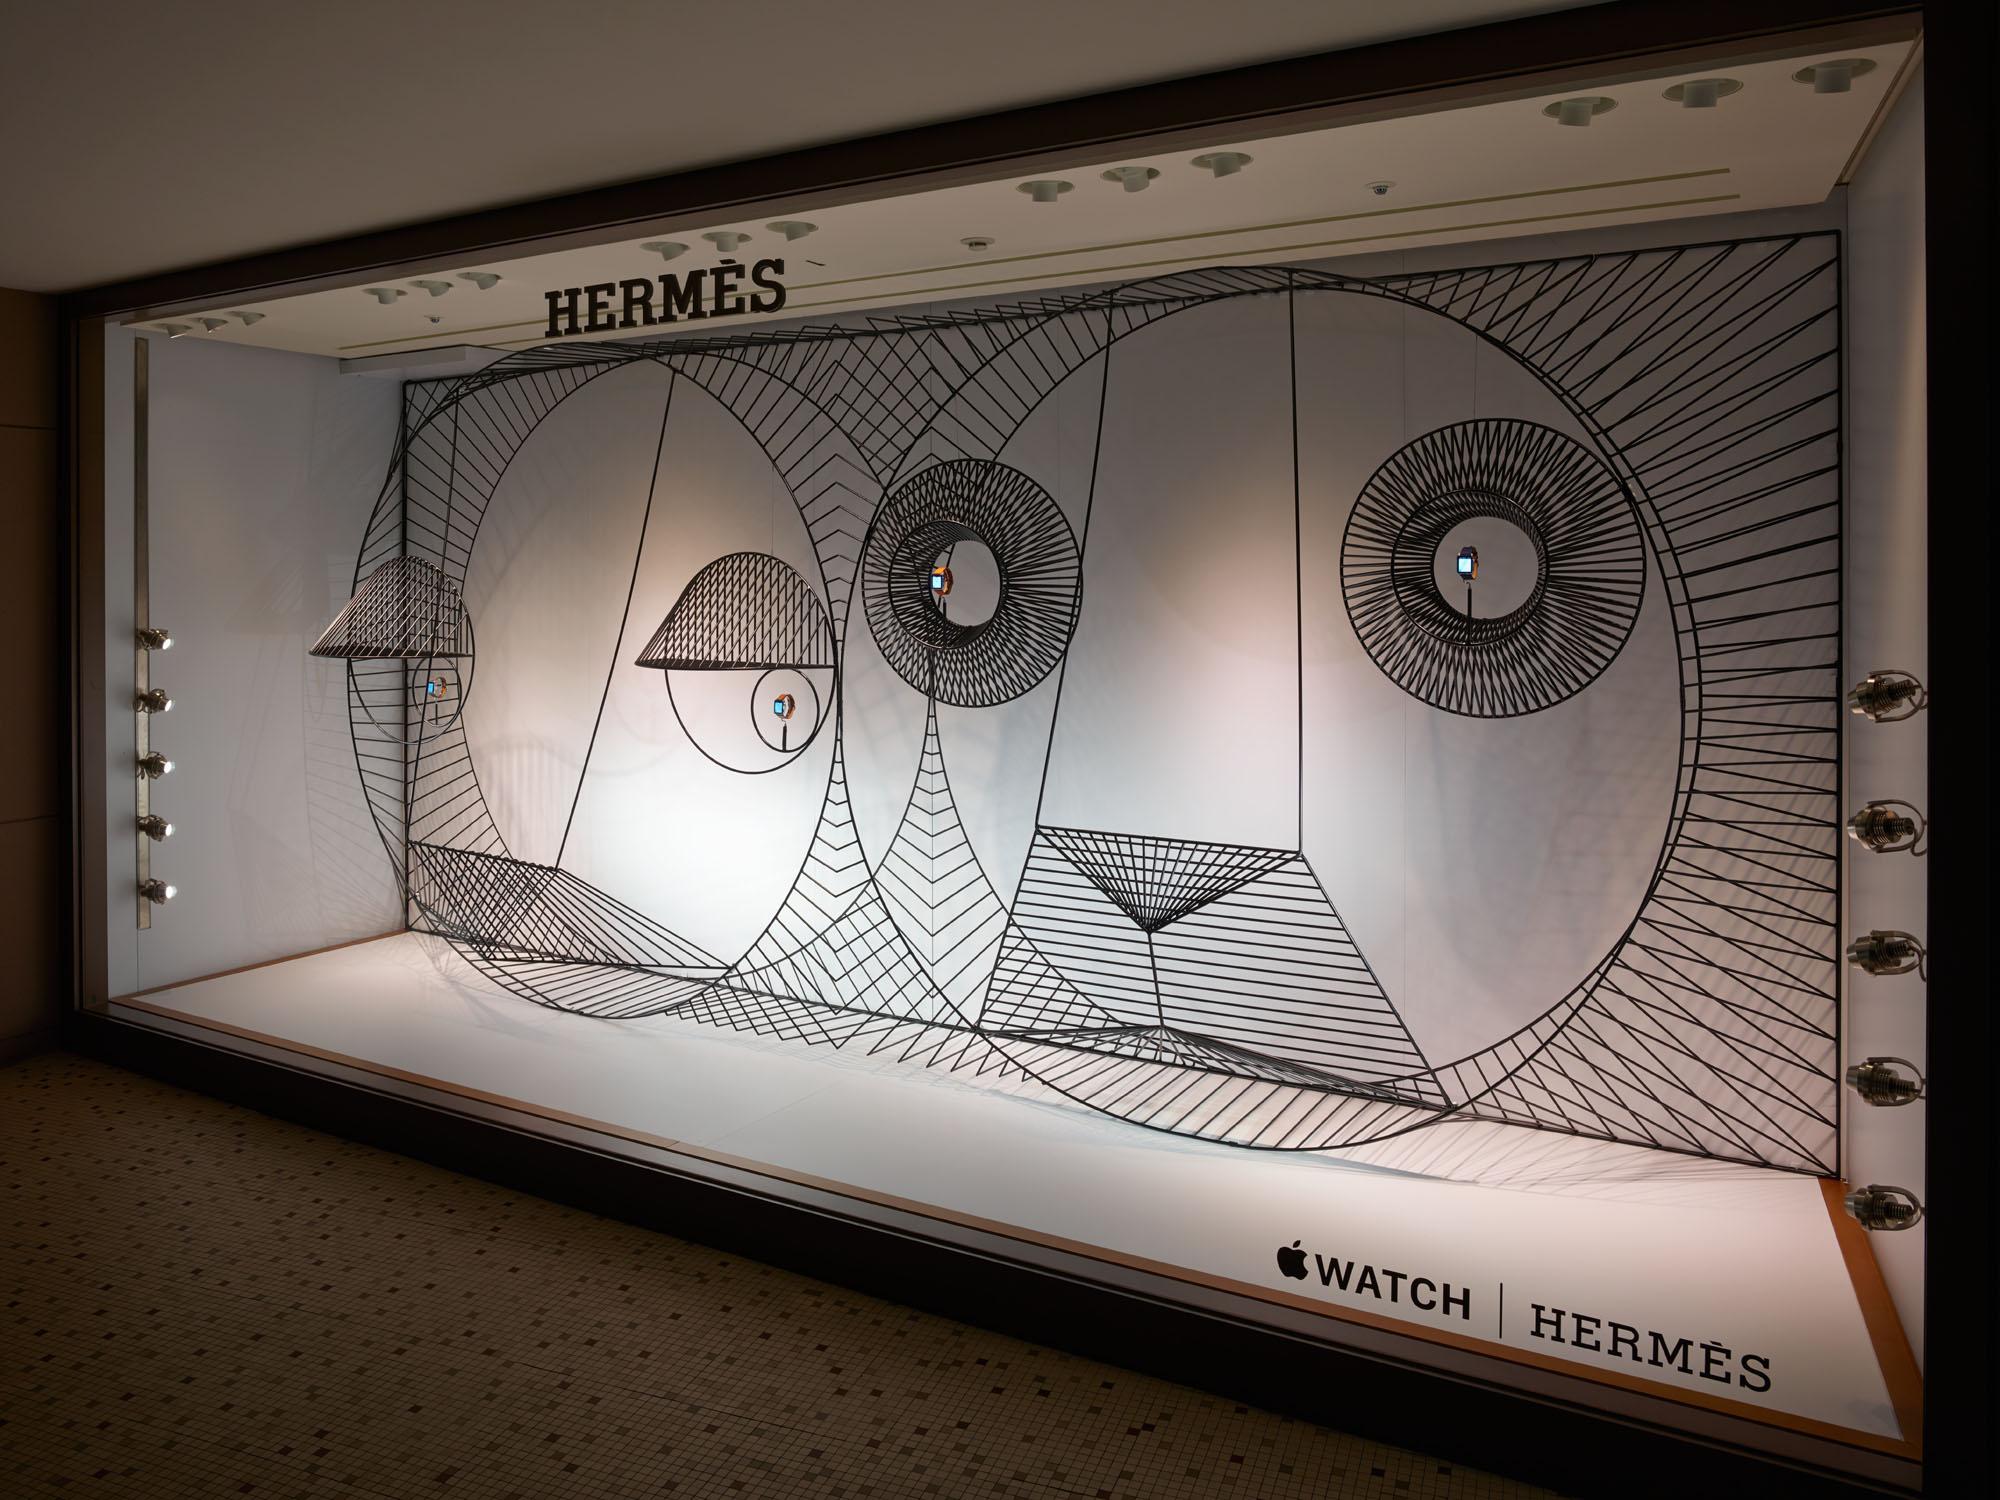 GamFratesi_Hermès_Courtesy of Hermès Japon_Ph. Nacása & Partners 03.jpg